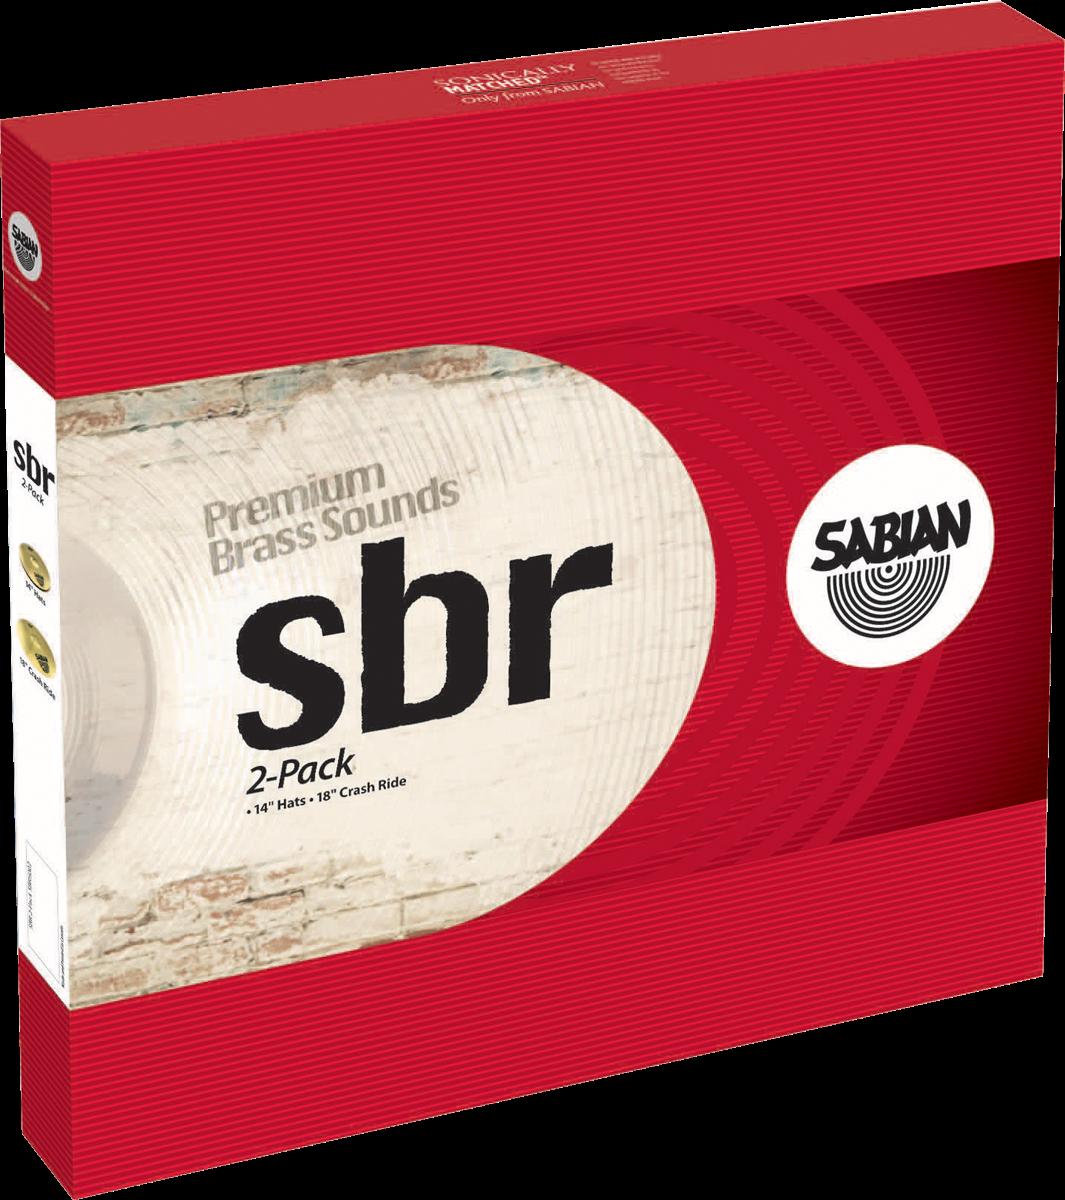 "Sabian Cymbaal SBR Harmonisch Pack 2-Pack 14""-18"""